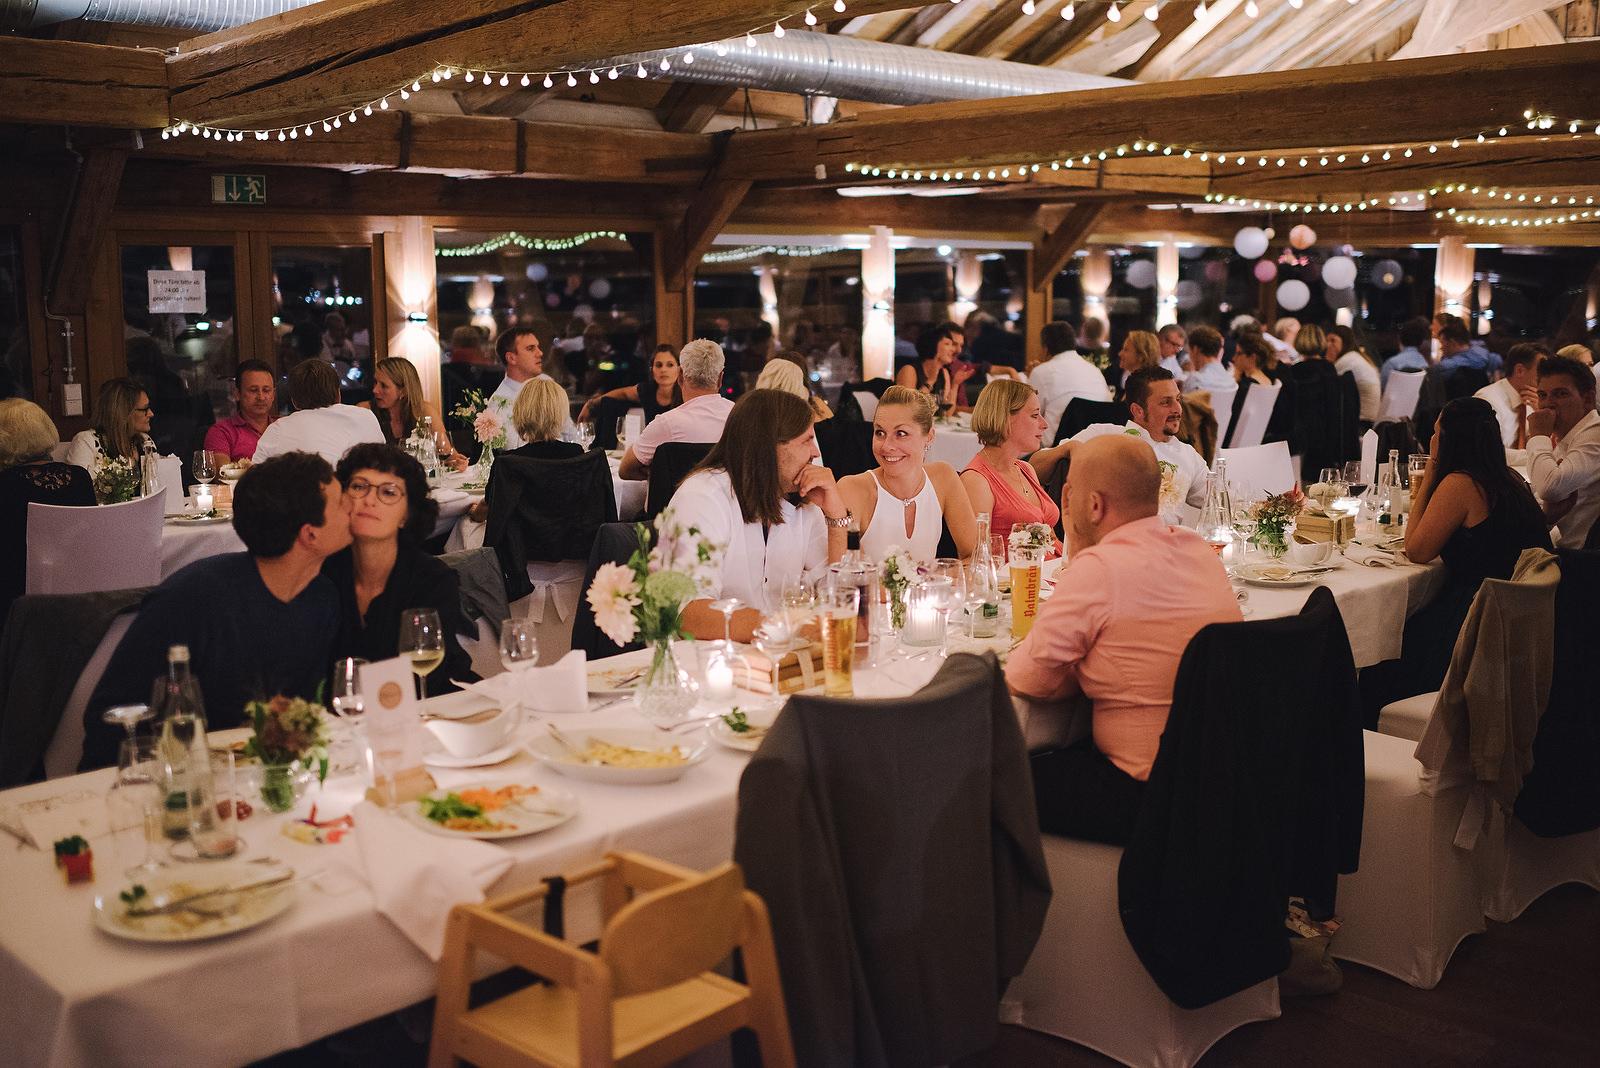 Fotograf Konstanz - Hochzeitsfotograf Reutlingen Achalm Hochzeit EFP 92 - Als Hochzeitsfotograf auf der Achalm, Reutlingen  - 75 -